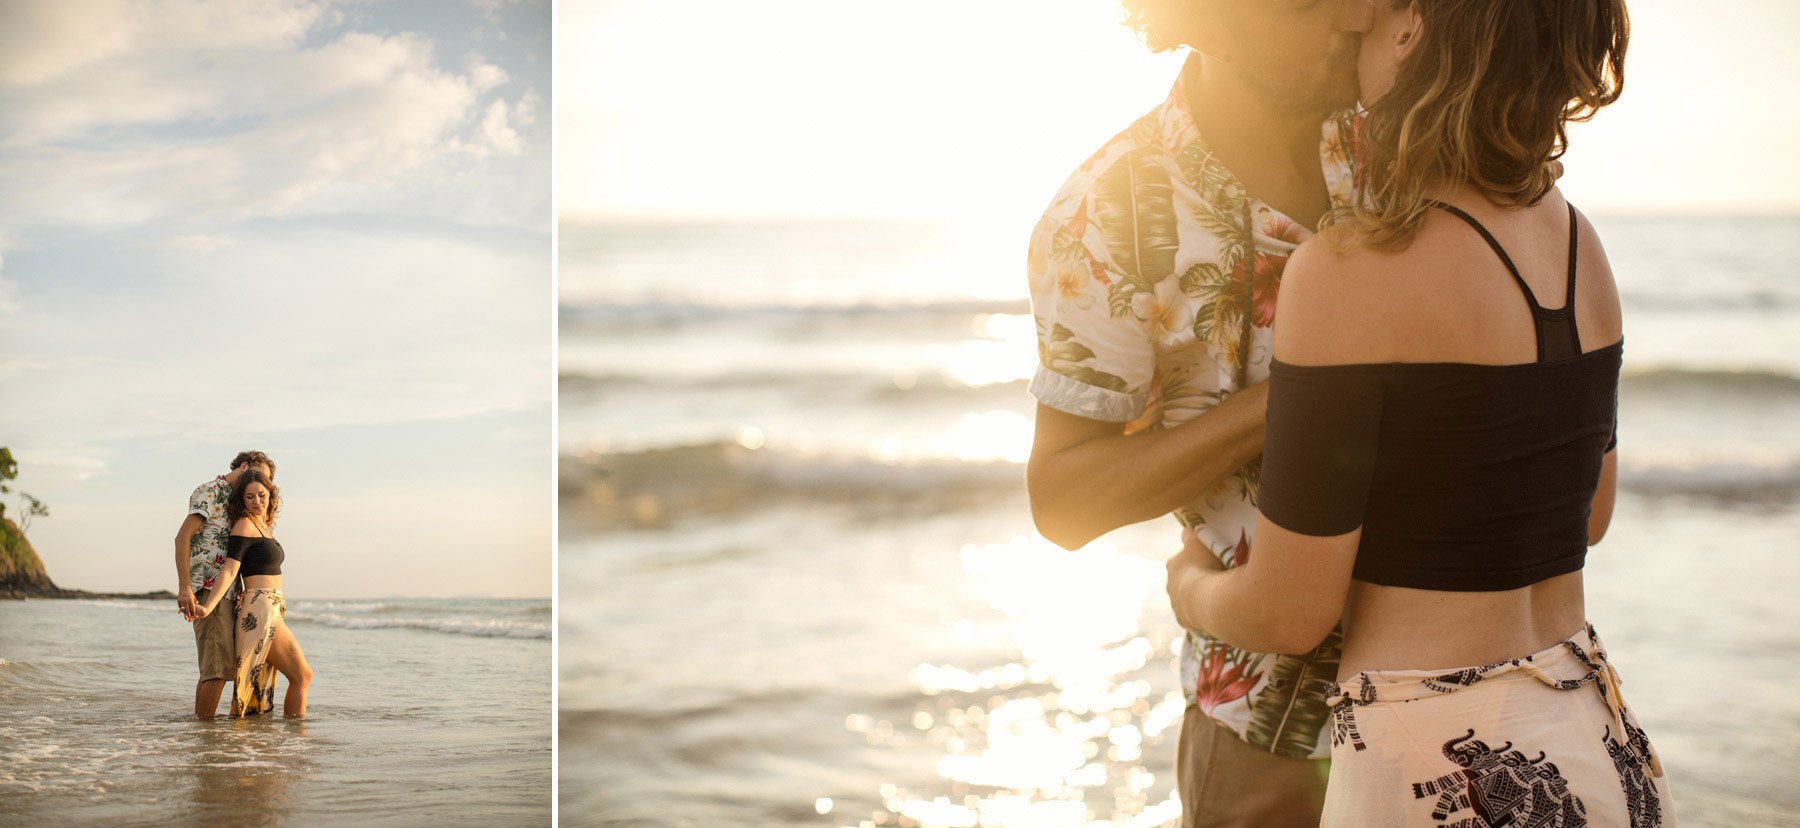 magical-light-on-kan-tiang-beach-thailand